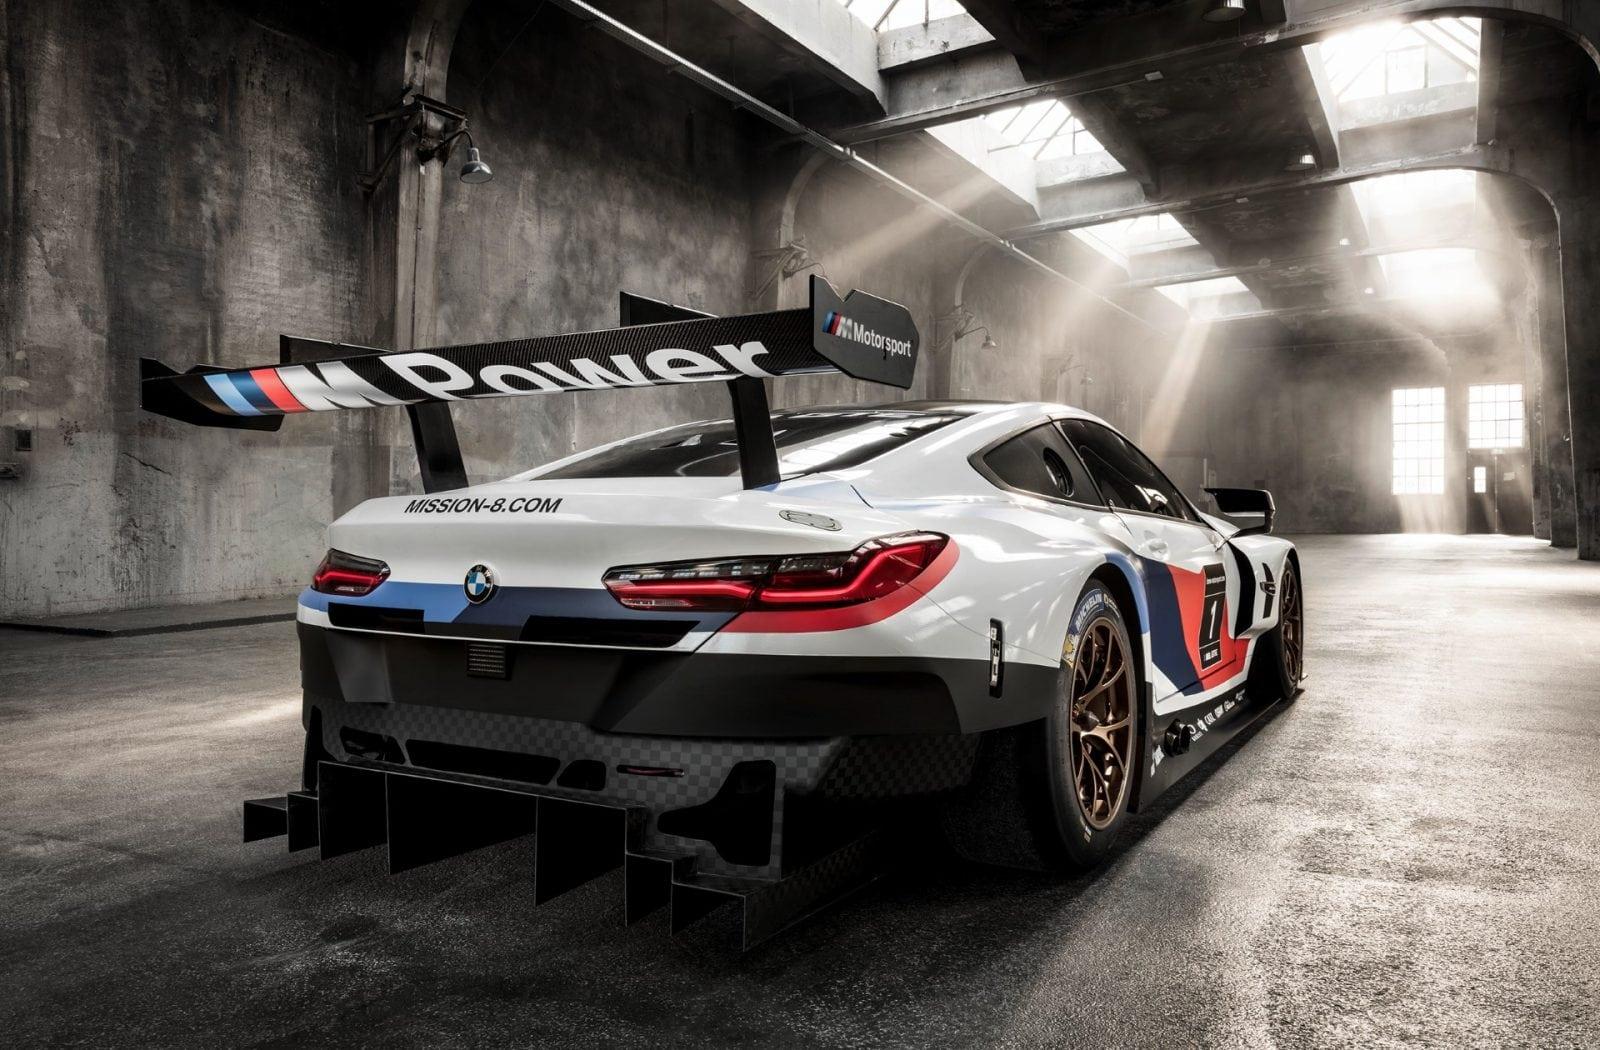 BMW M8 GTE 2017 Official Photos